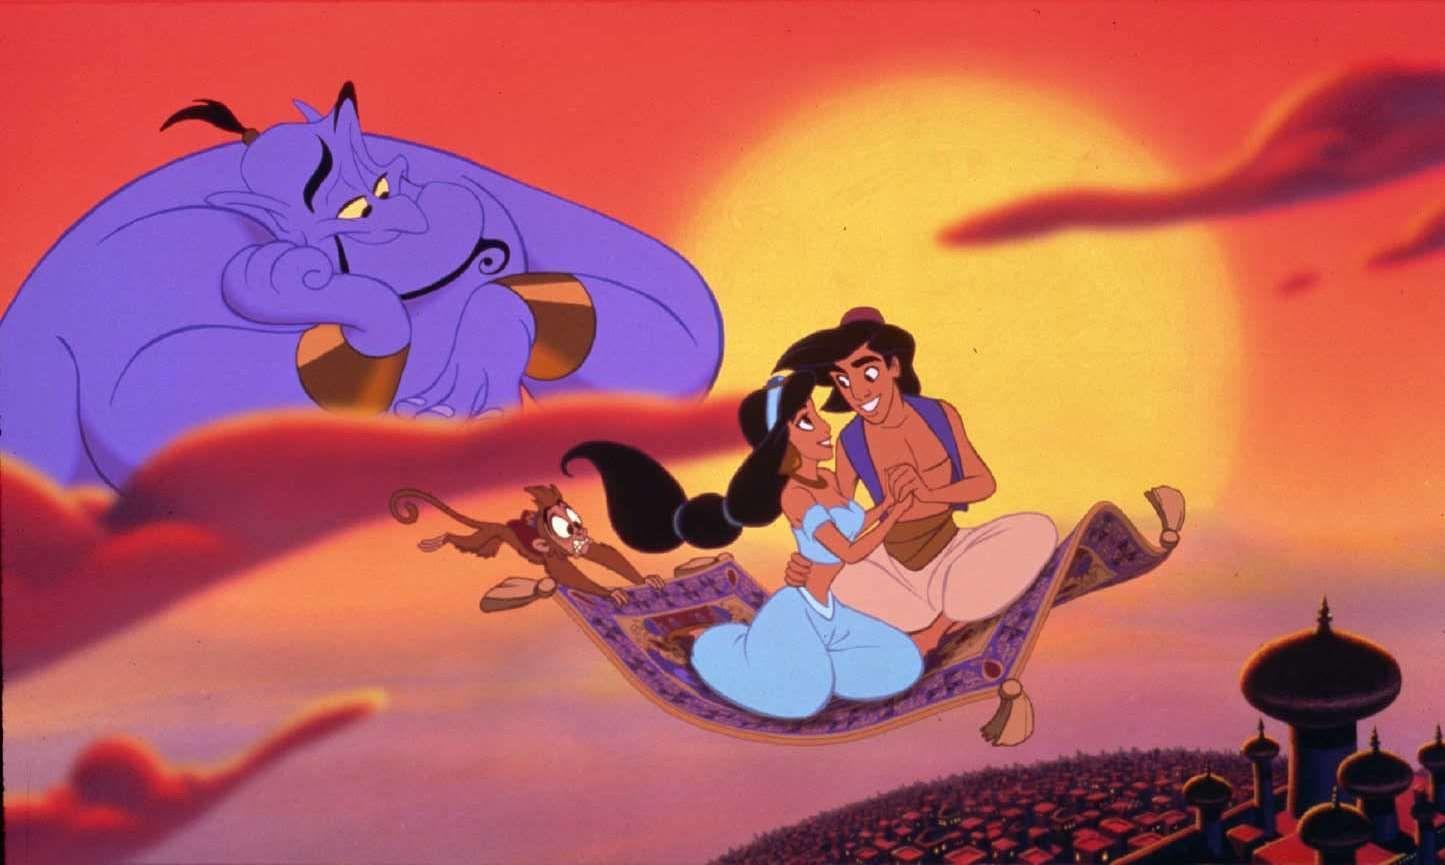 Disney's 'Aladdin' to appear on Broadway next year - LA Times